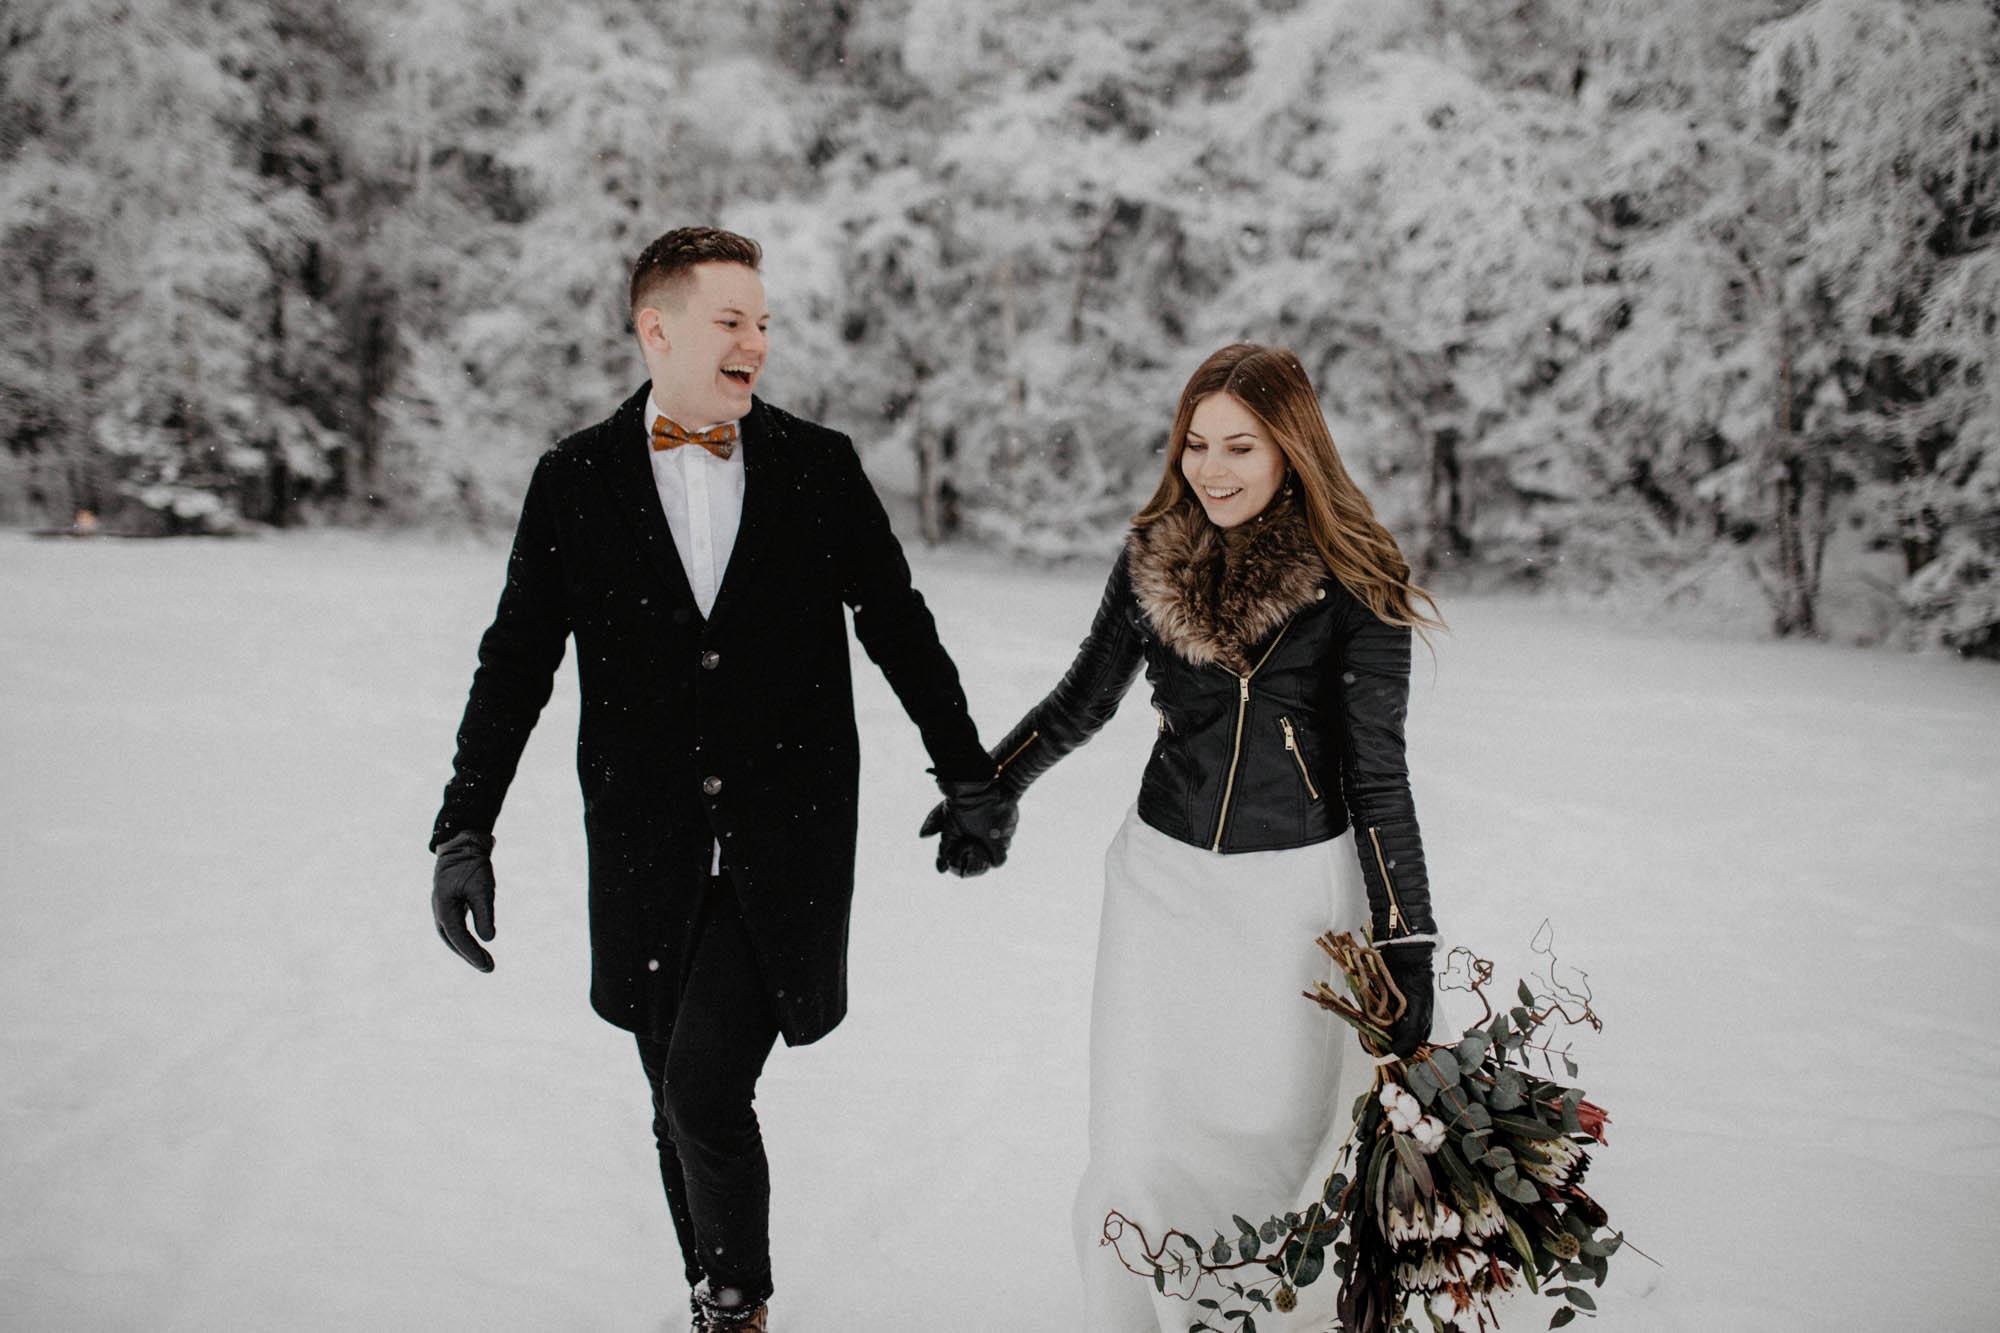 ashley_schulman_photography-winter_wedding_tampere-44.jpg